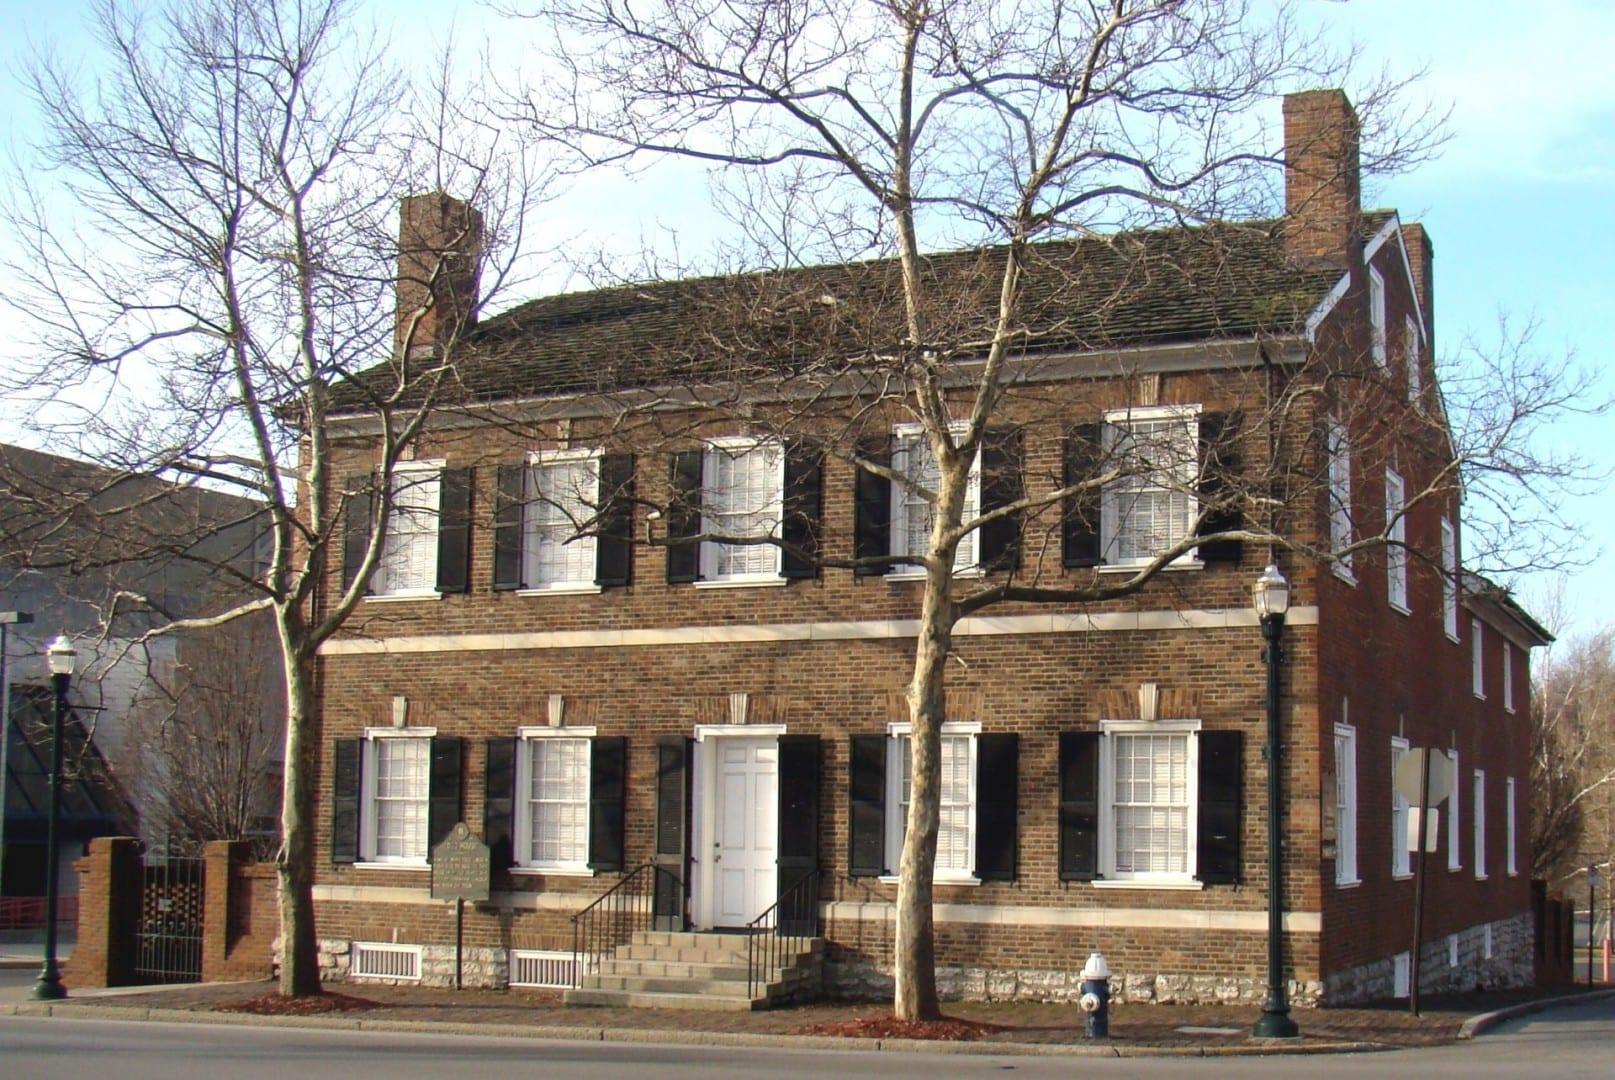 Casa Mary Todd Lincoln, hogar de la infancia de la esposa del presidente Lincoln. Lexington KY Estados Unidos